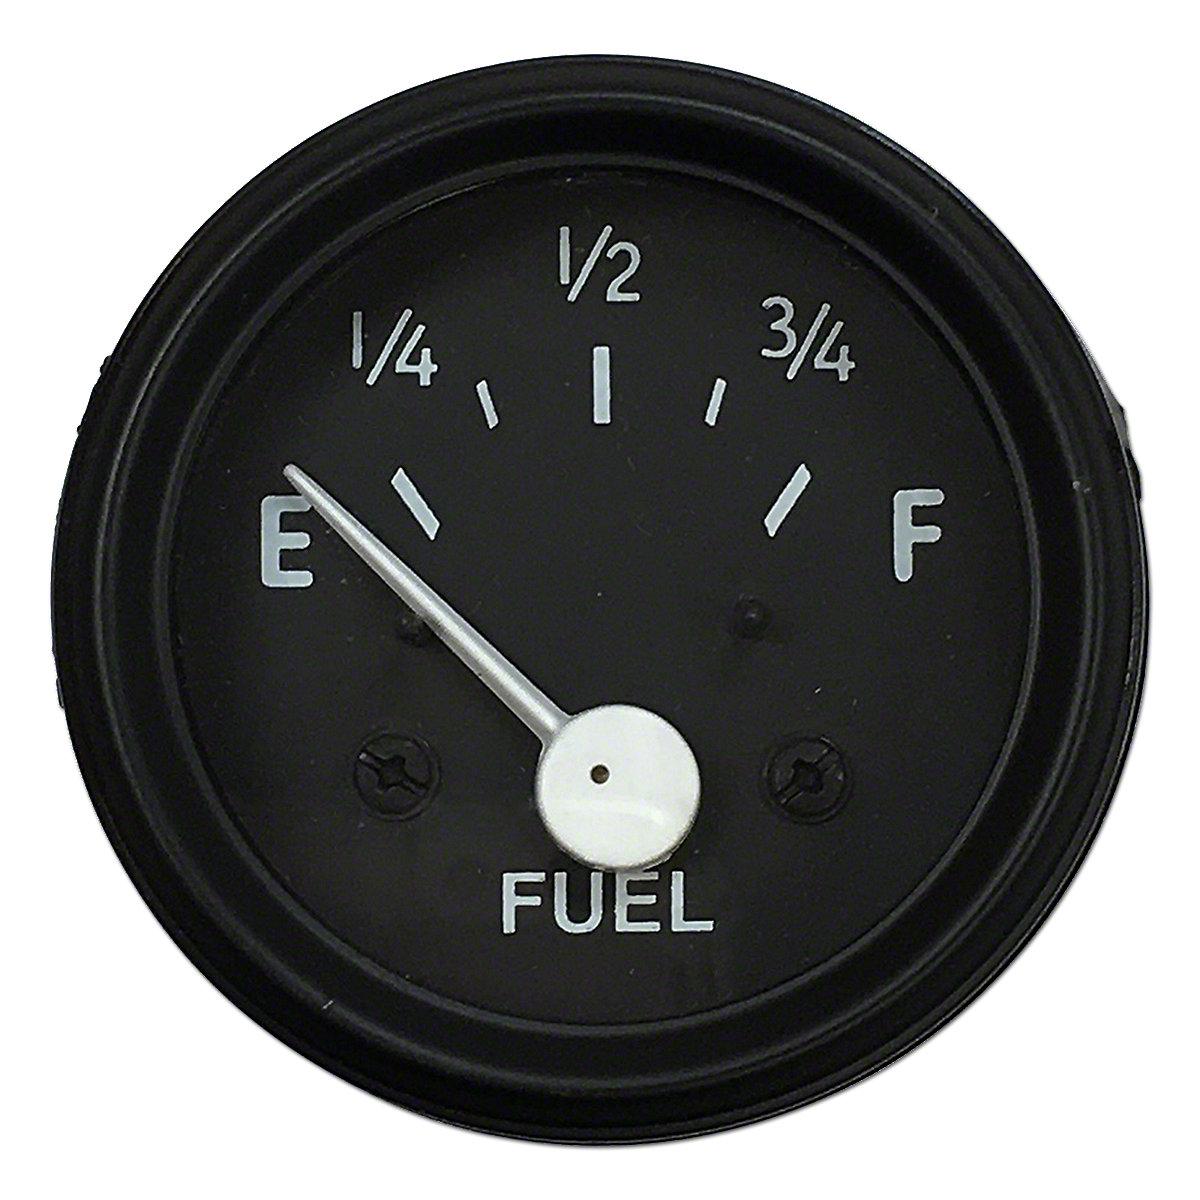 12 volt negative ground fuel gauge jds3476 farmall 6 volt regulator wiring jds3476 12 volt negative ground fuel gauge